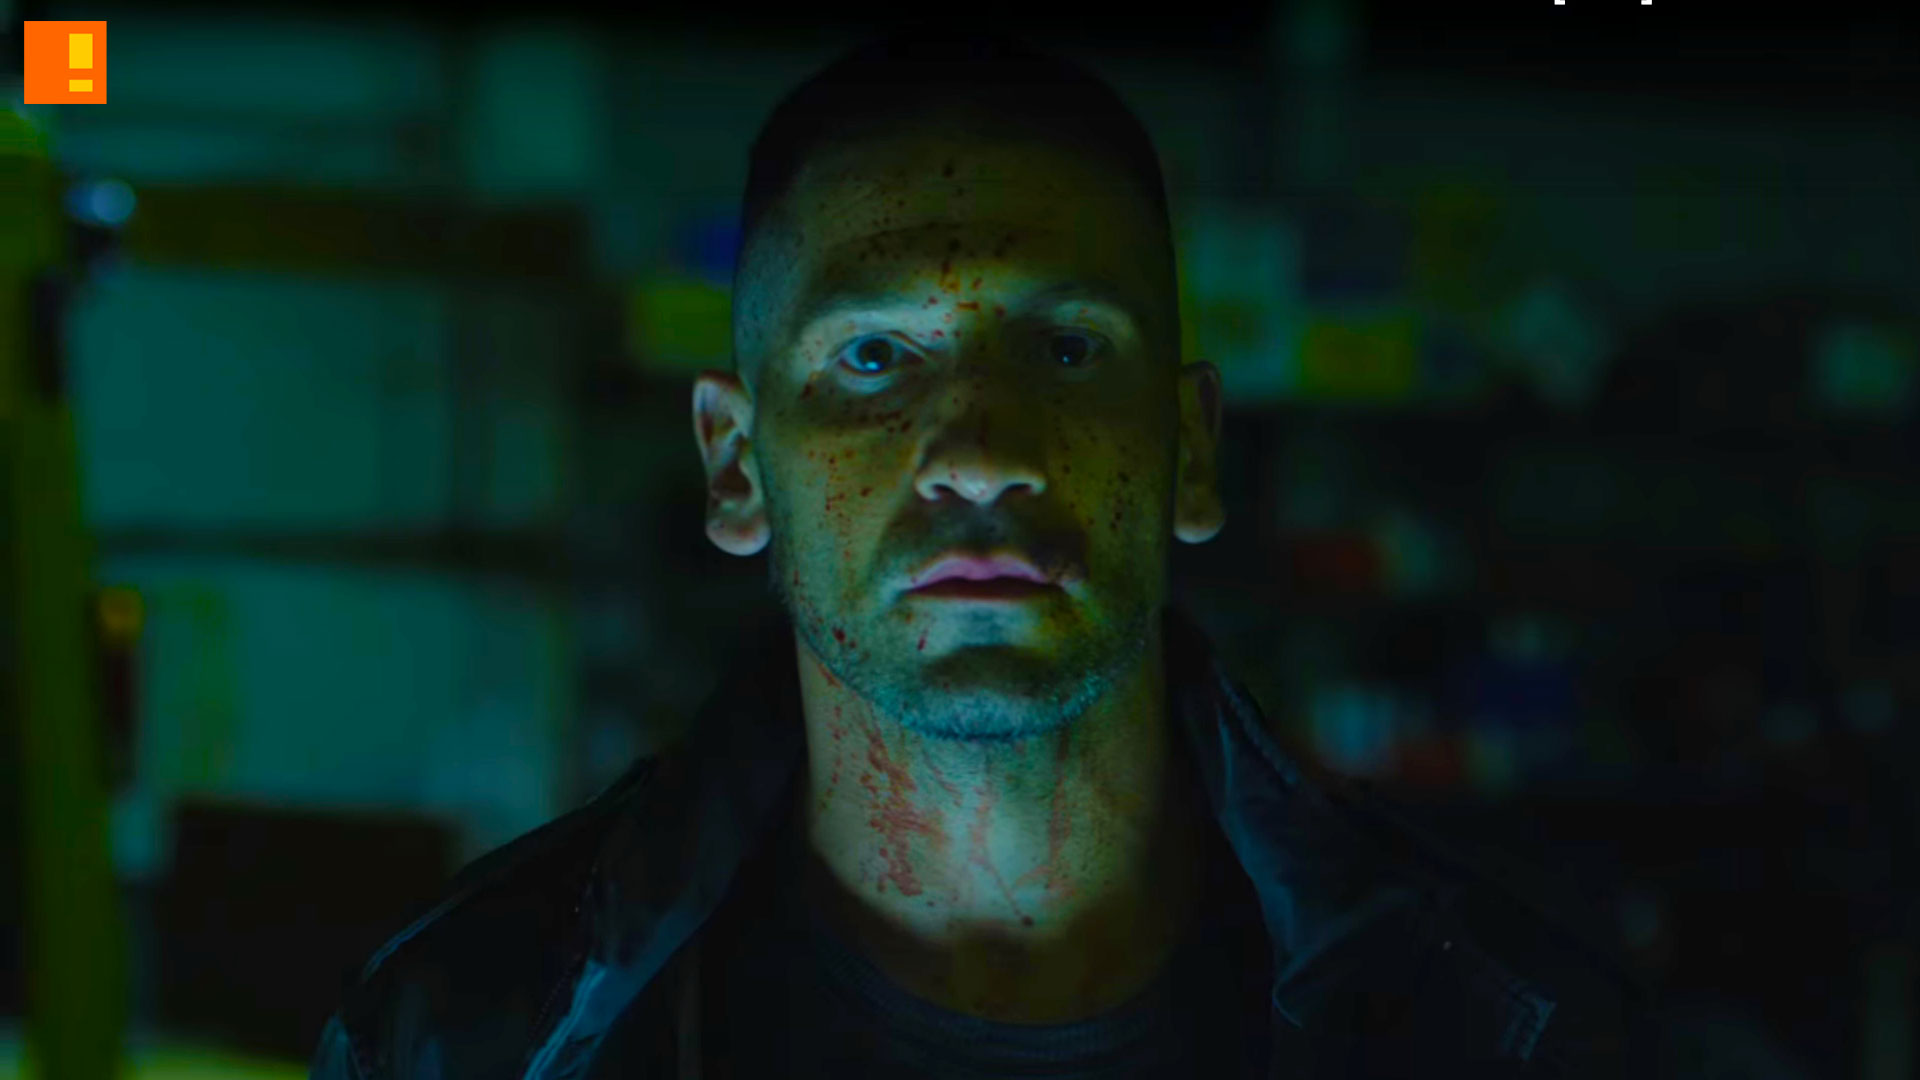 Marvels Daredevil Season 2 Official Trailer Part 1 Brings The